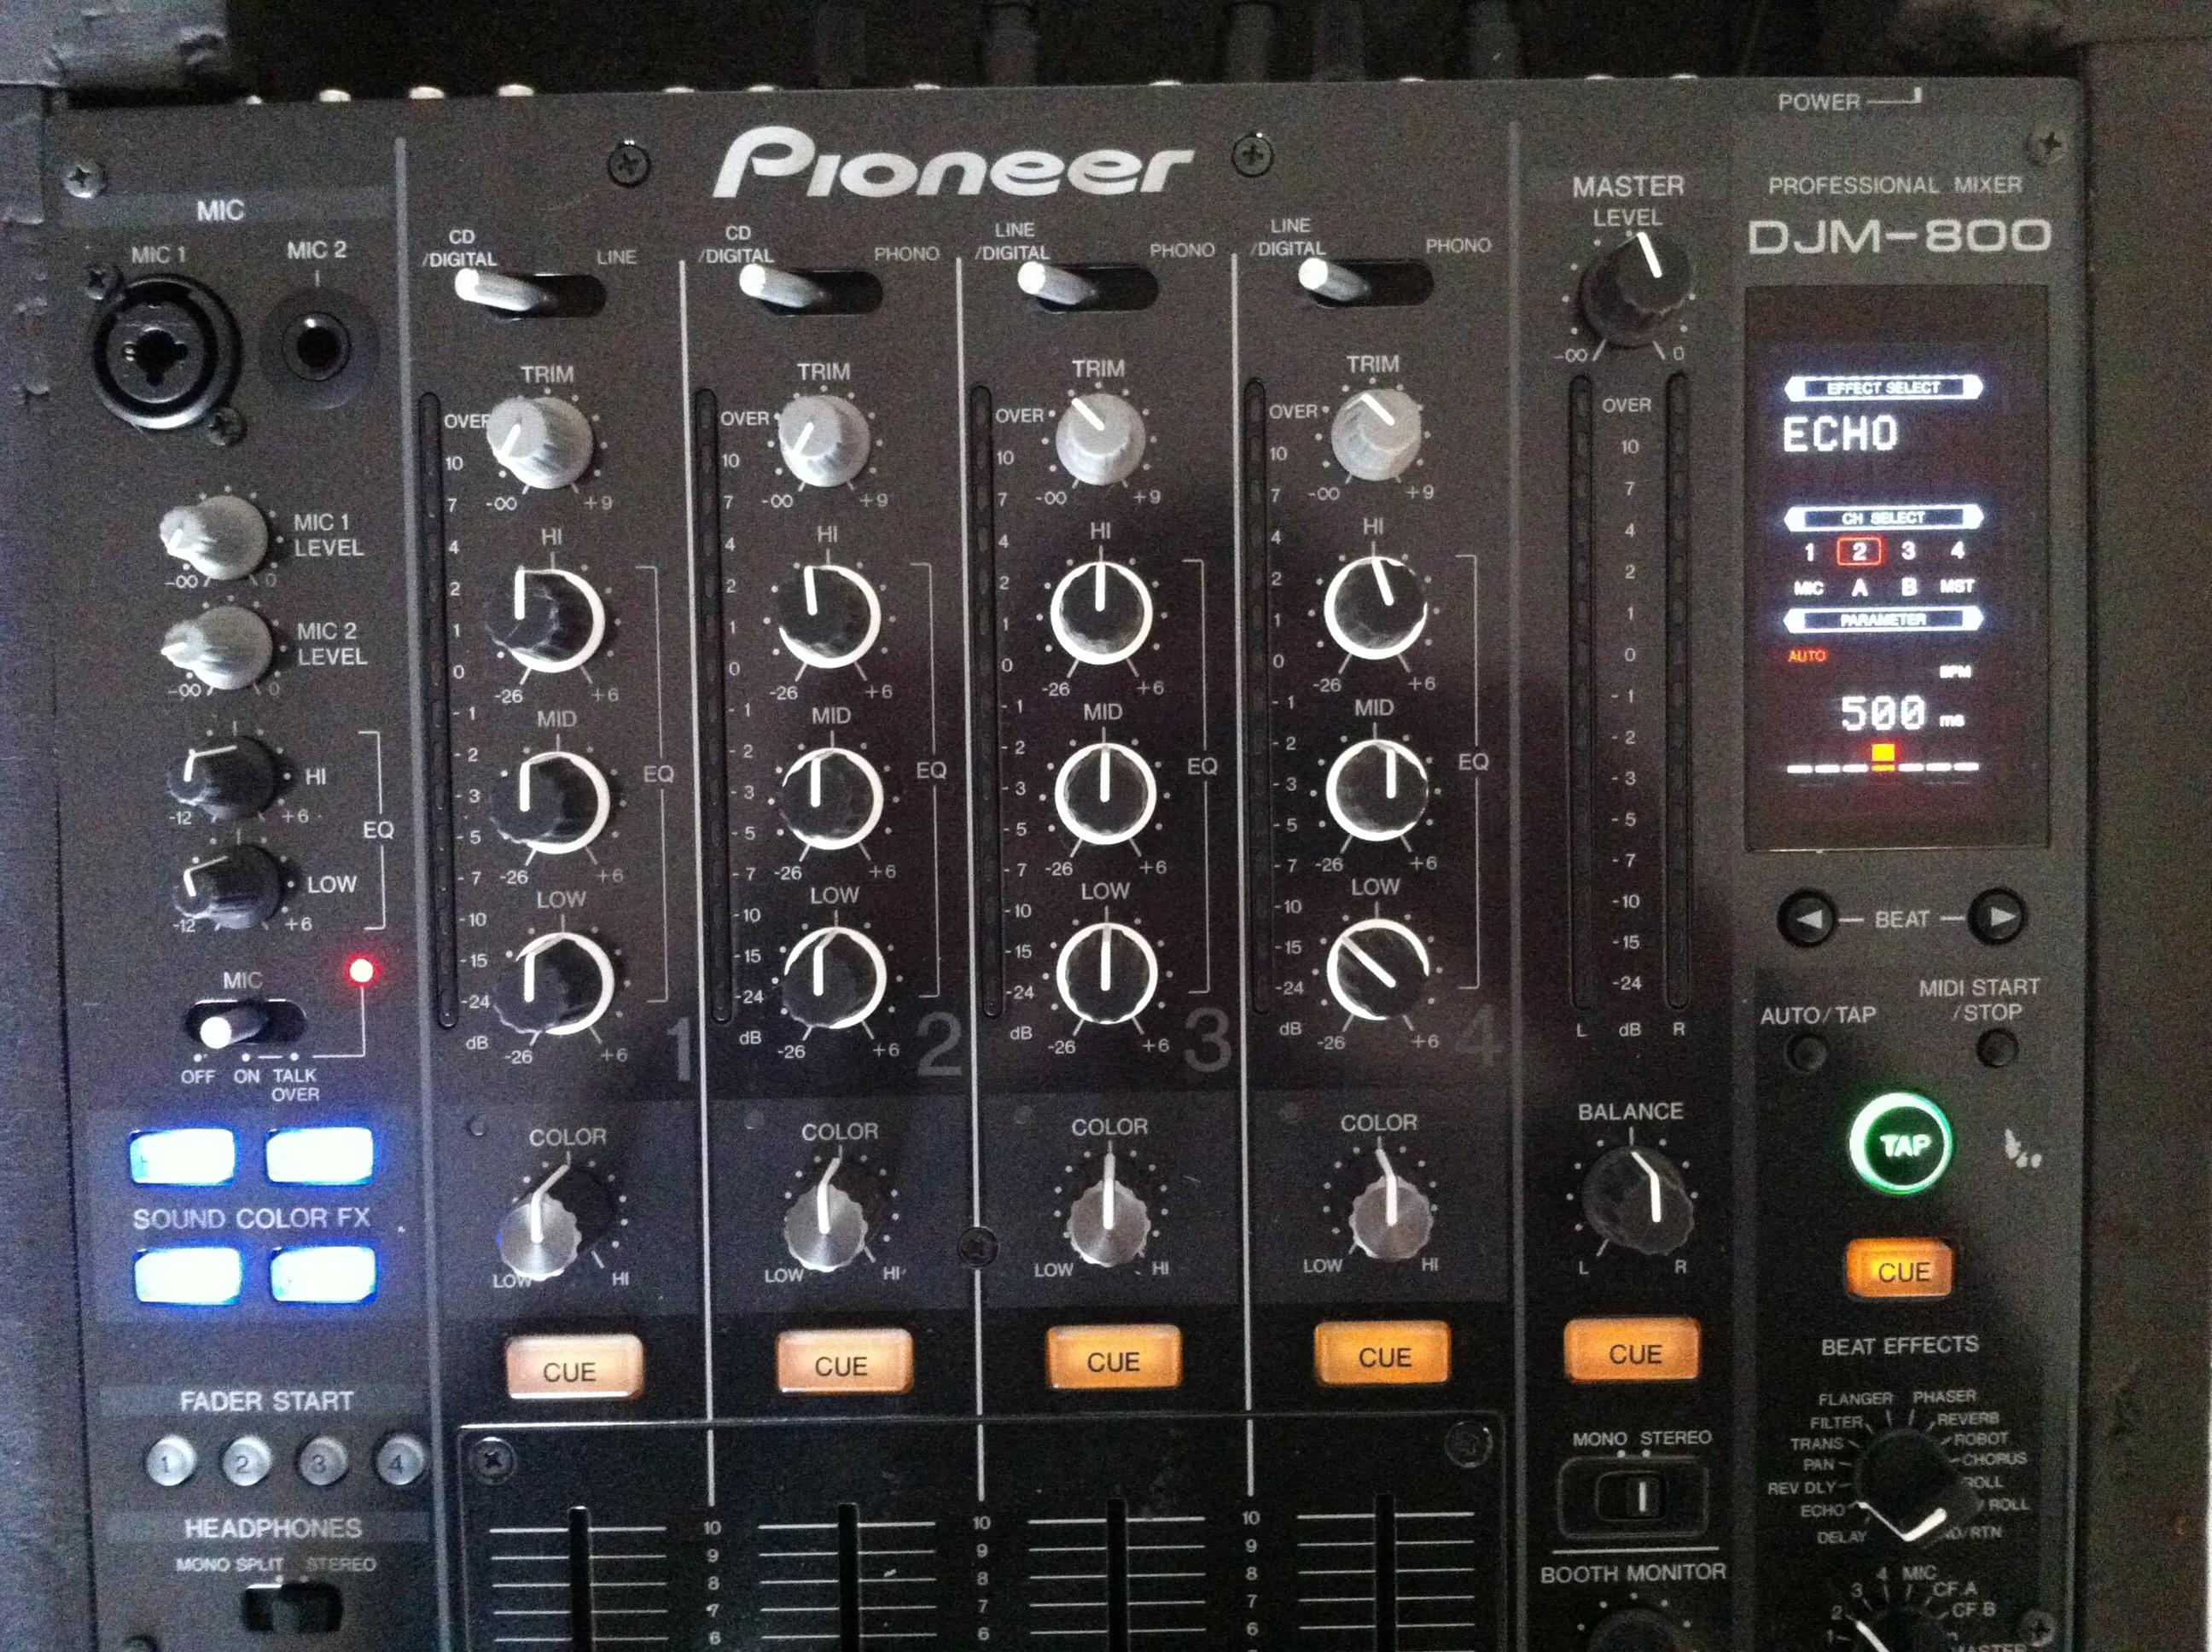 pioneer djm 800 image 505779 audiofanzine rh en audiofanzine com Pioneer 2000 CDJ with Mixer Pioneer DJ Mixer